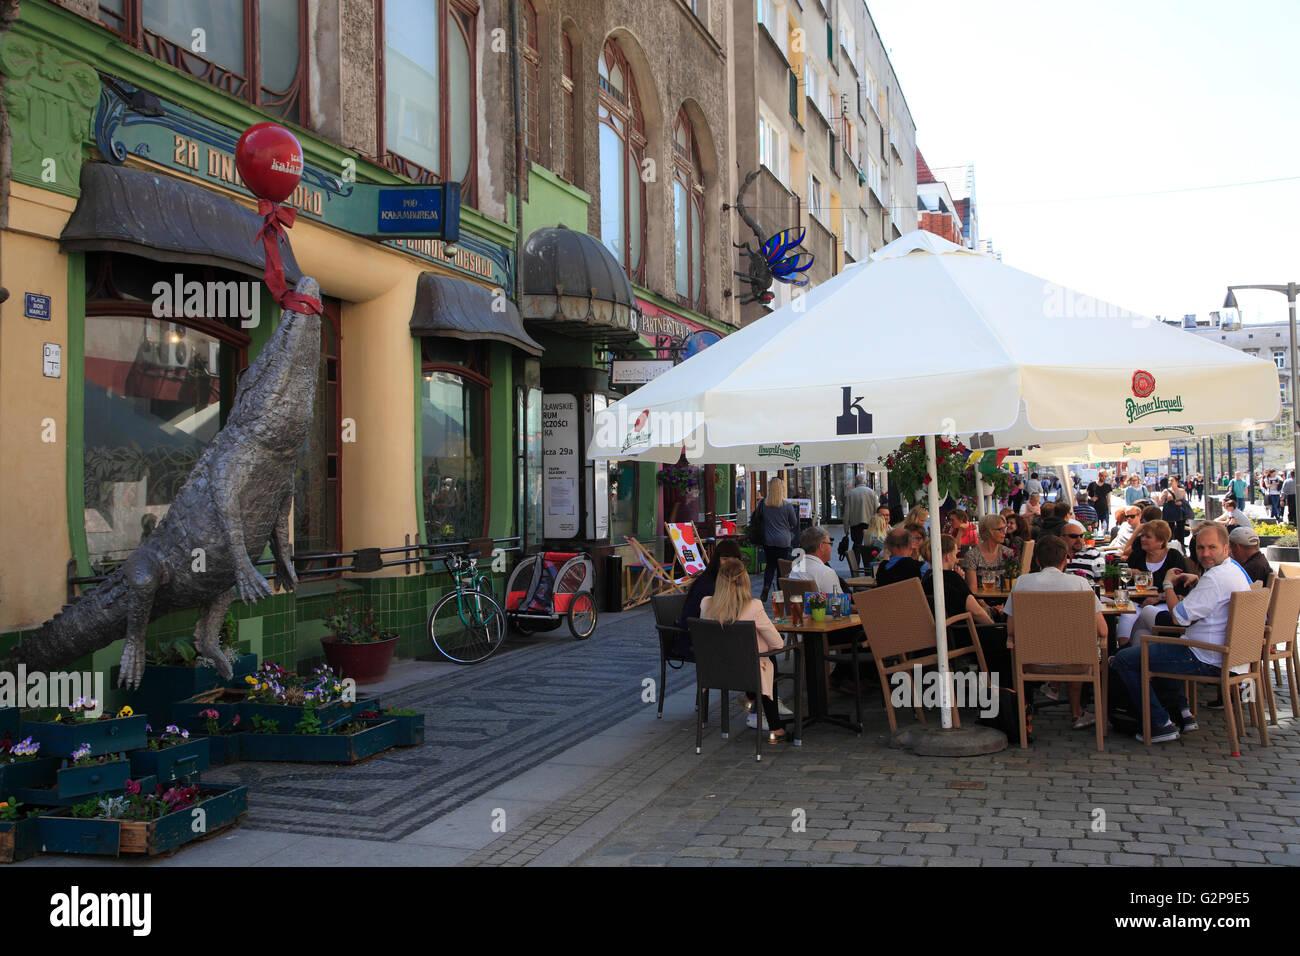 Art cafe und Bar Kalambur, Wroclaw, Silesia, Poland, Europe - Stock Image